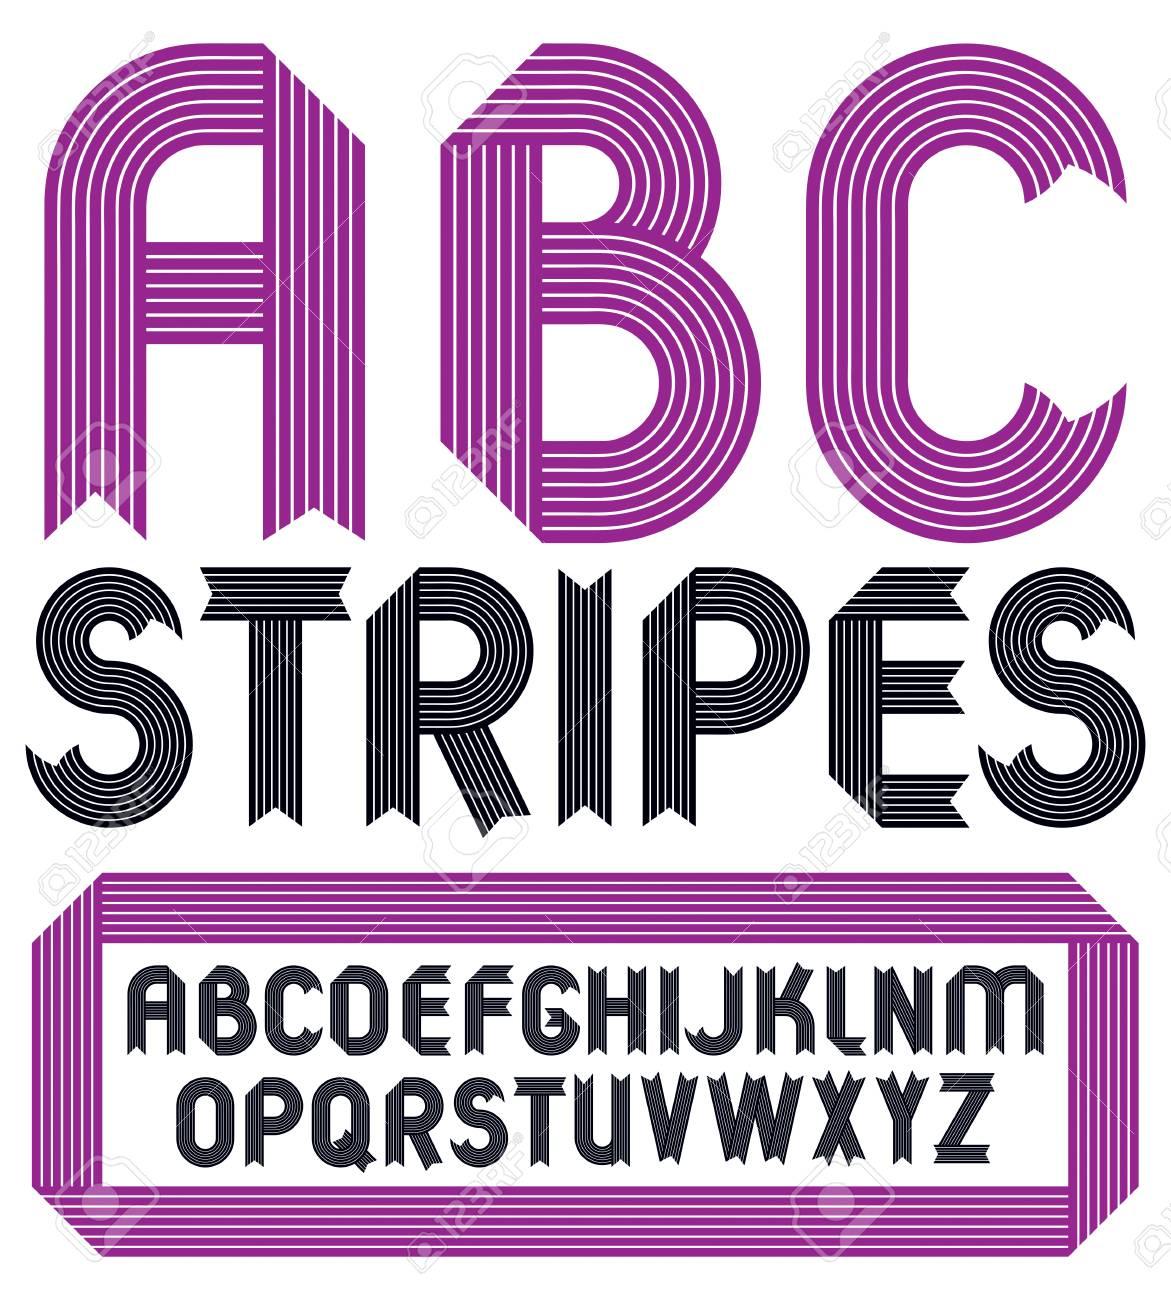 Abc Creation tout set of trendy vector capital alphabet letters, abc isolated